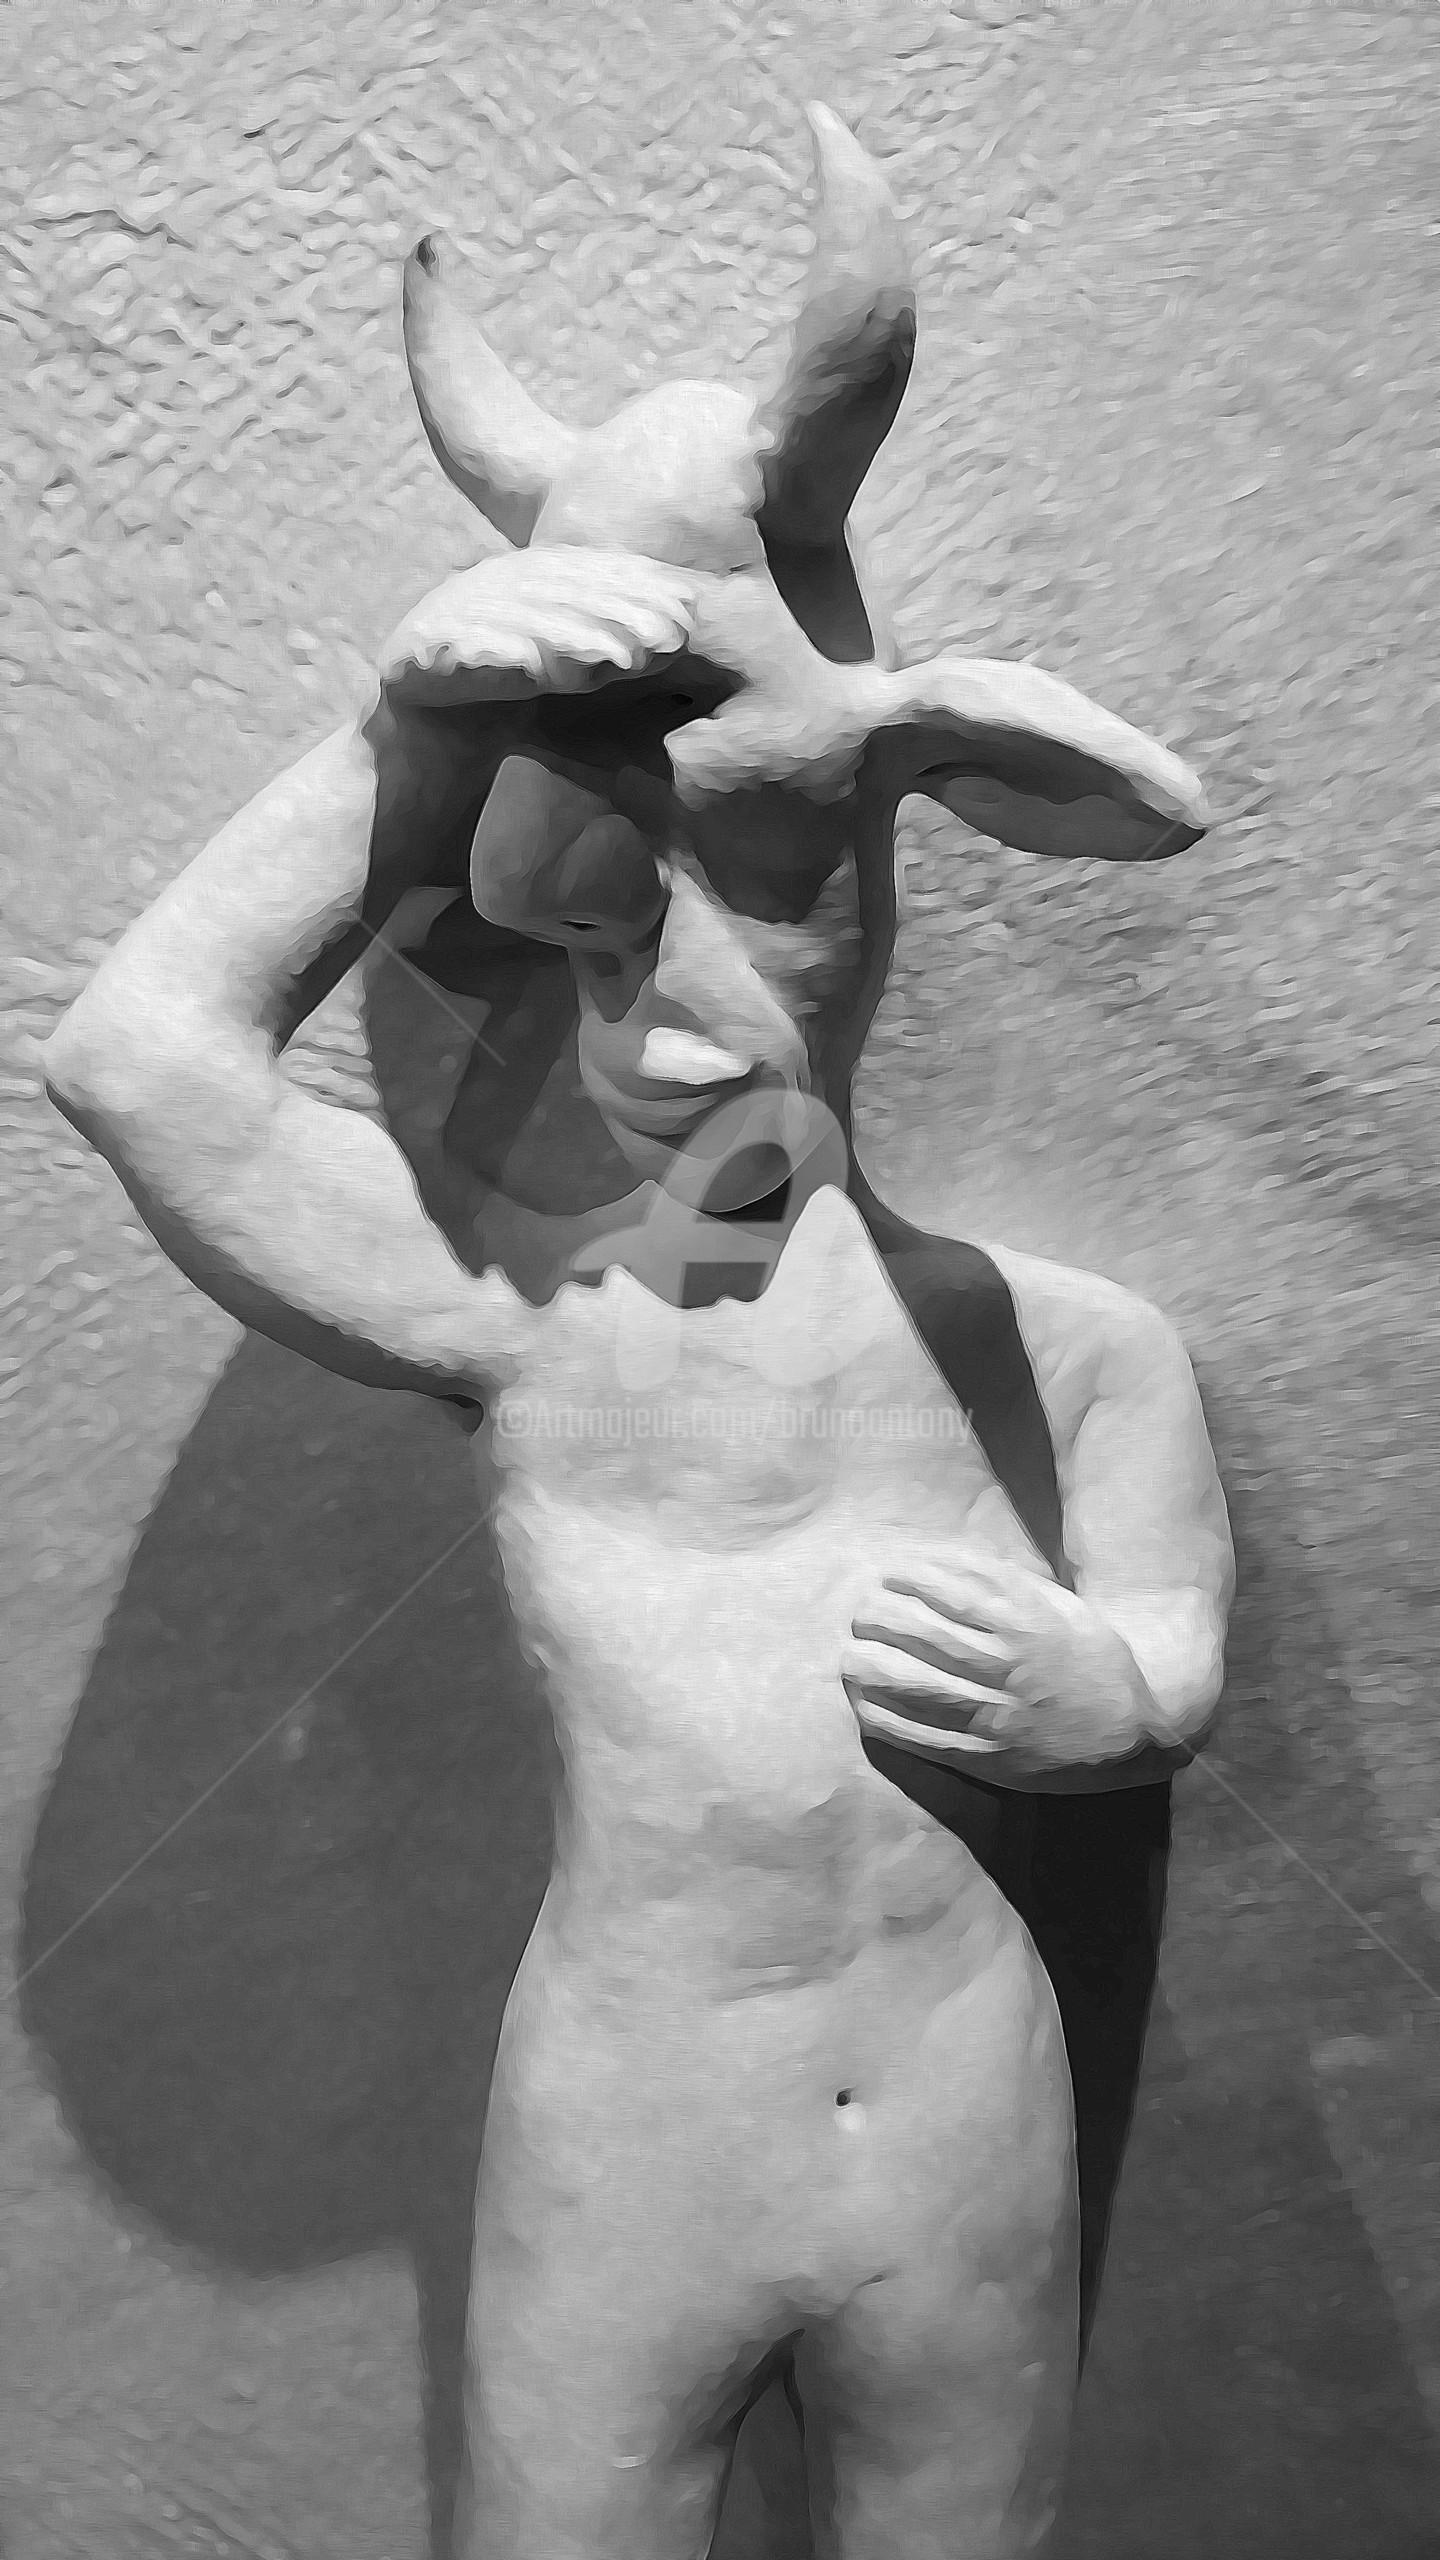 bruno antony-thouret (bruno antony) - Et si le monde était vache